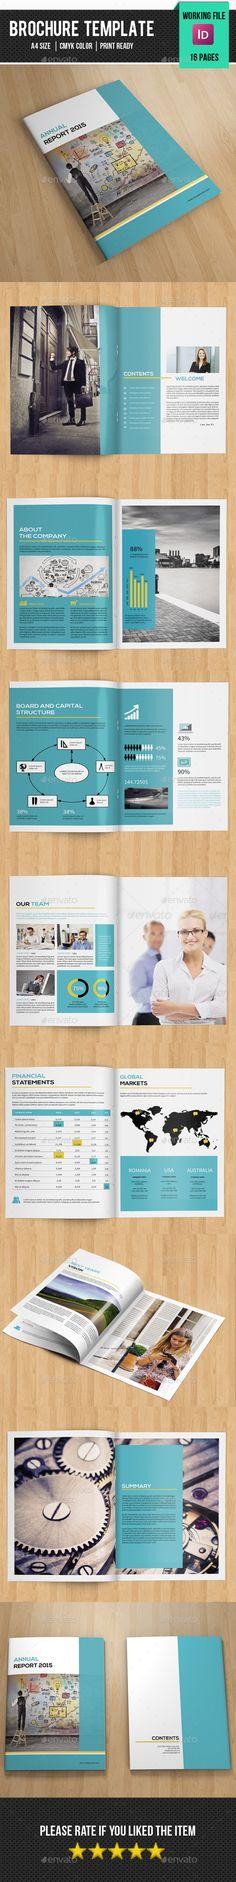 Annual Report Brochure Template #design Download: http://graphicriver.net/item/annual-report-brochurev272/12003819?ref=ksioks